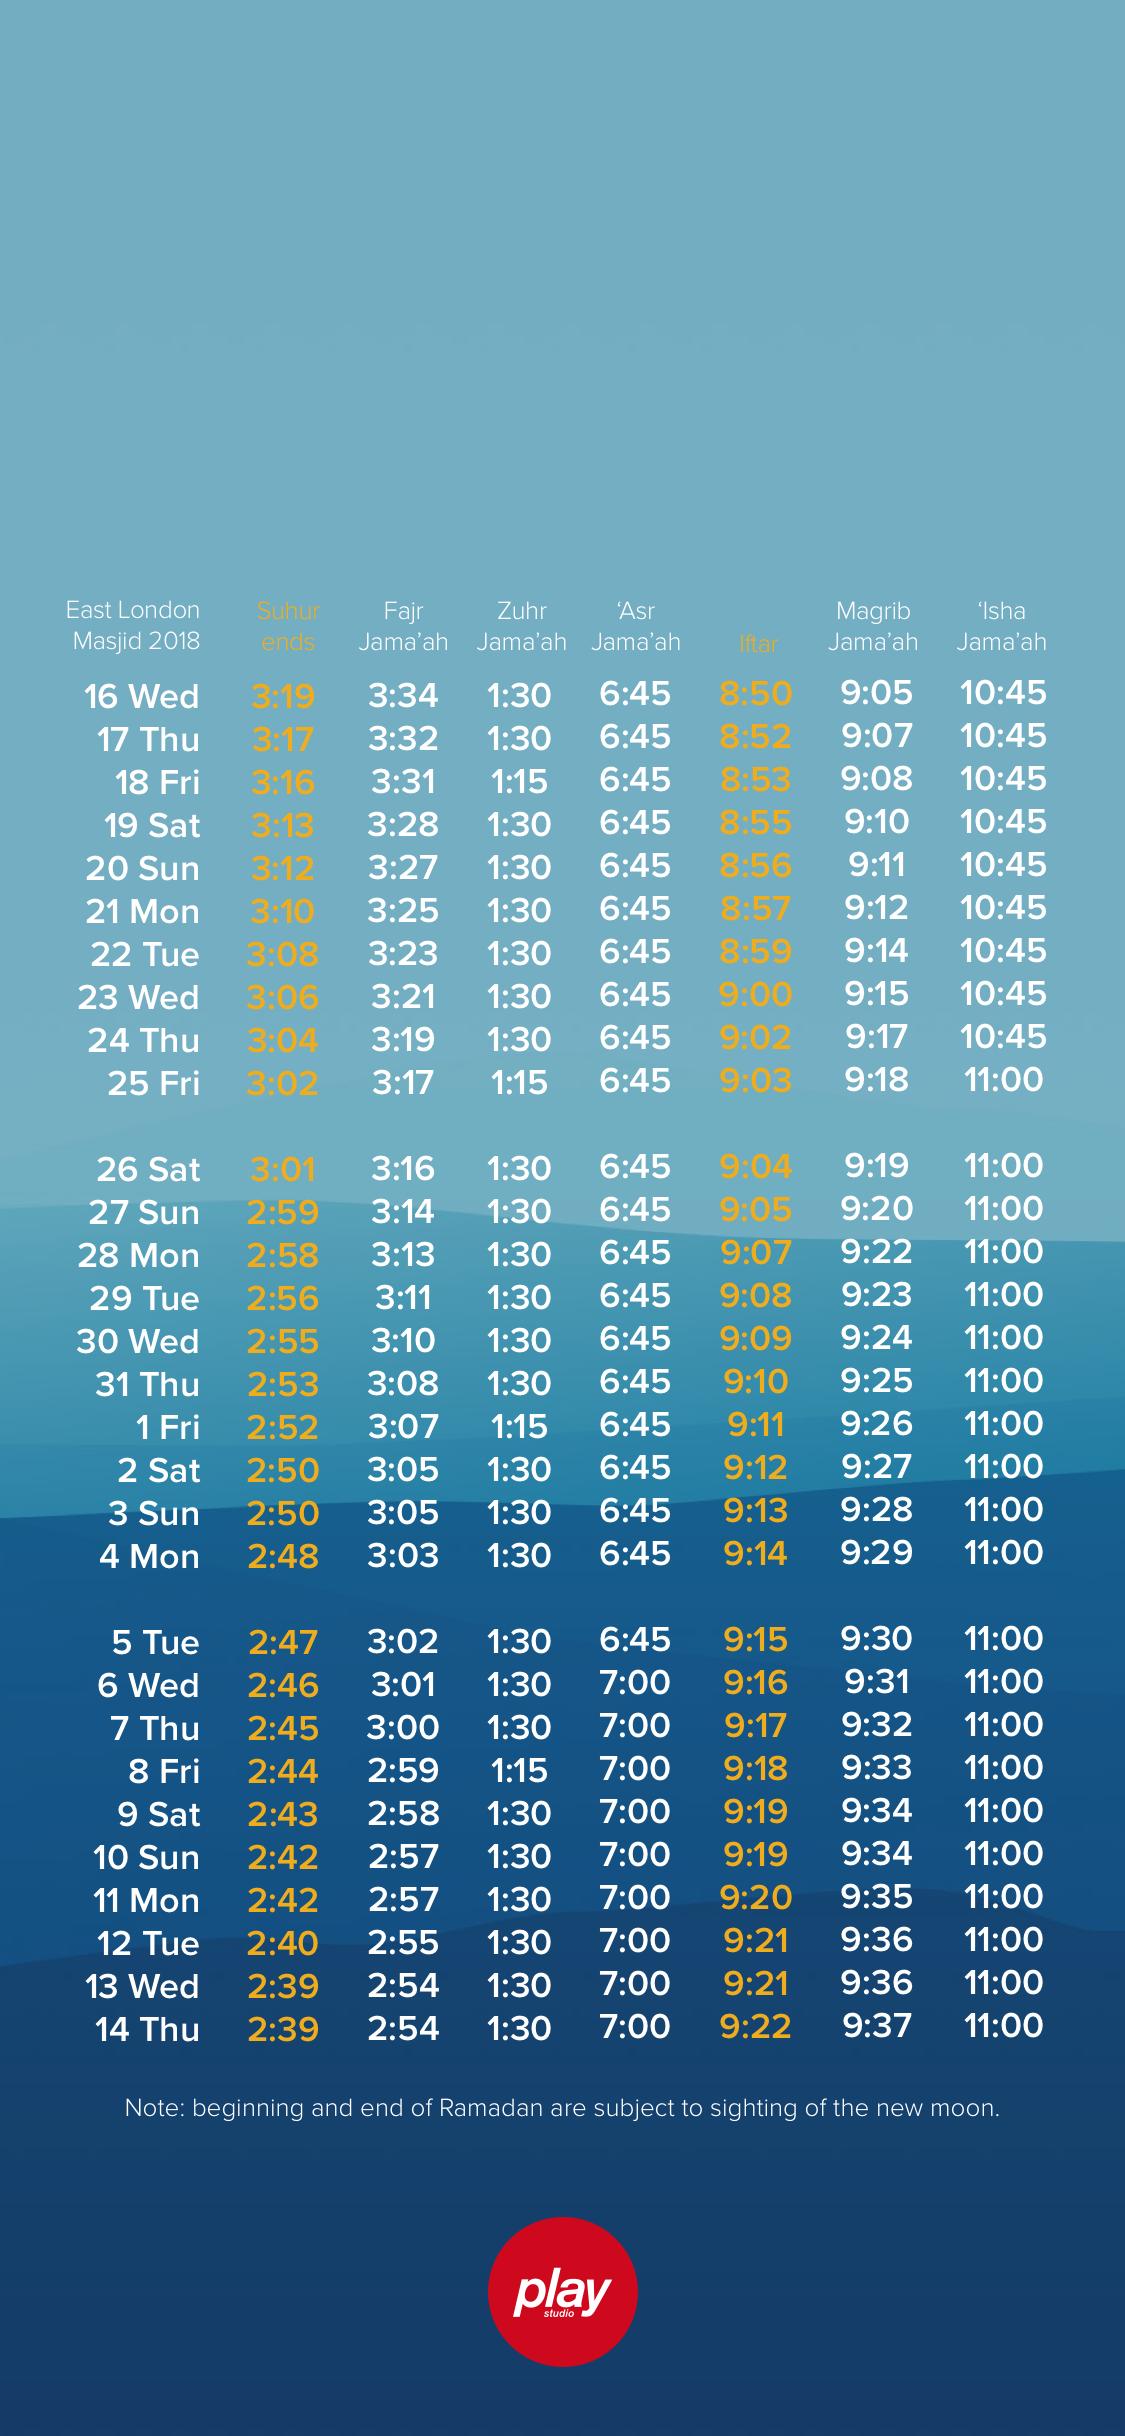 Ramadan Timetable Wallpaper Play Studio